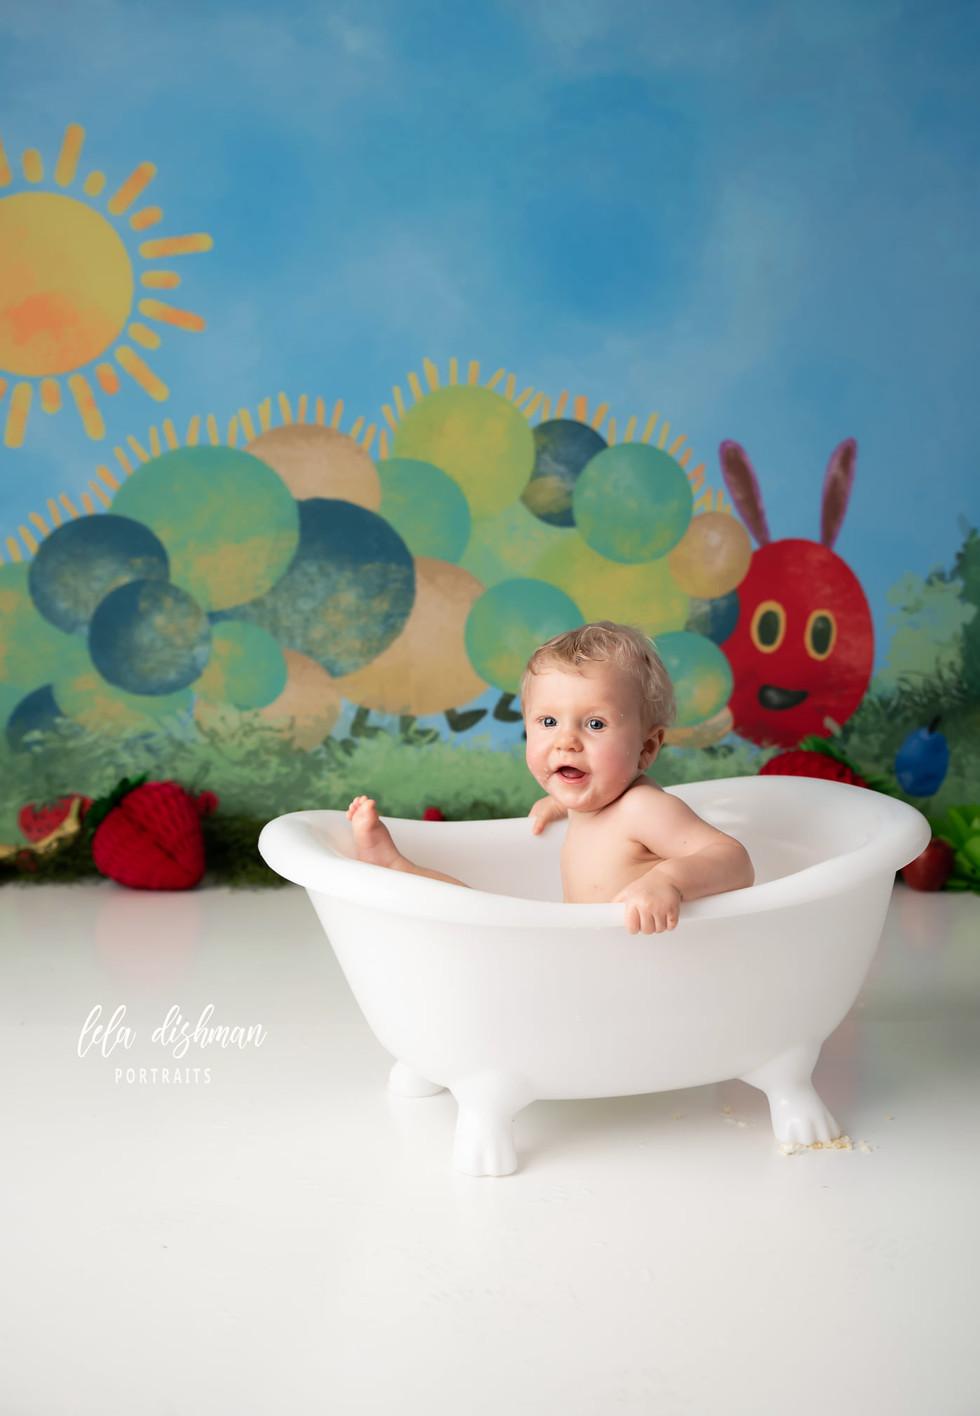 Wyatt is one ~ First Birthday Cake Smash Photographer- Lela Dishman Portraits